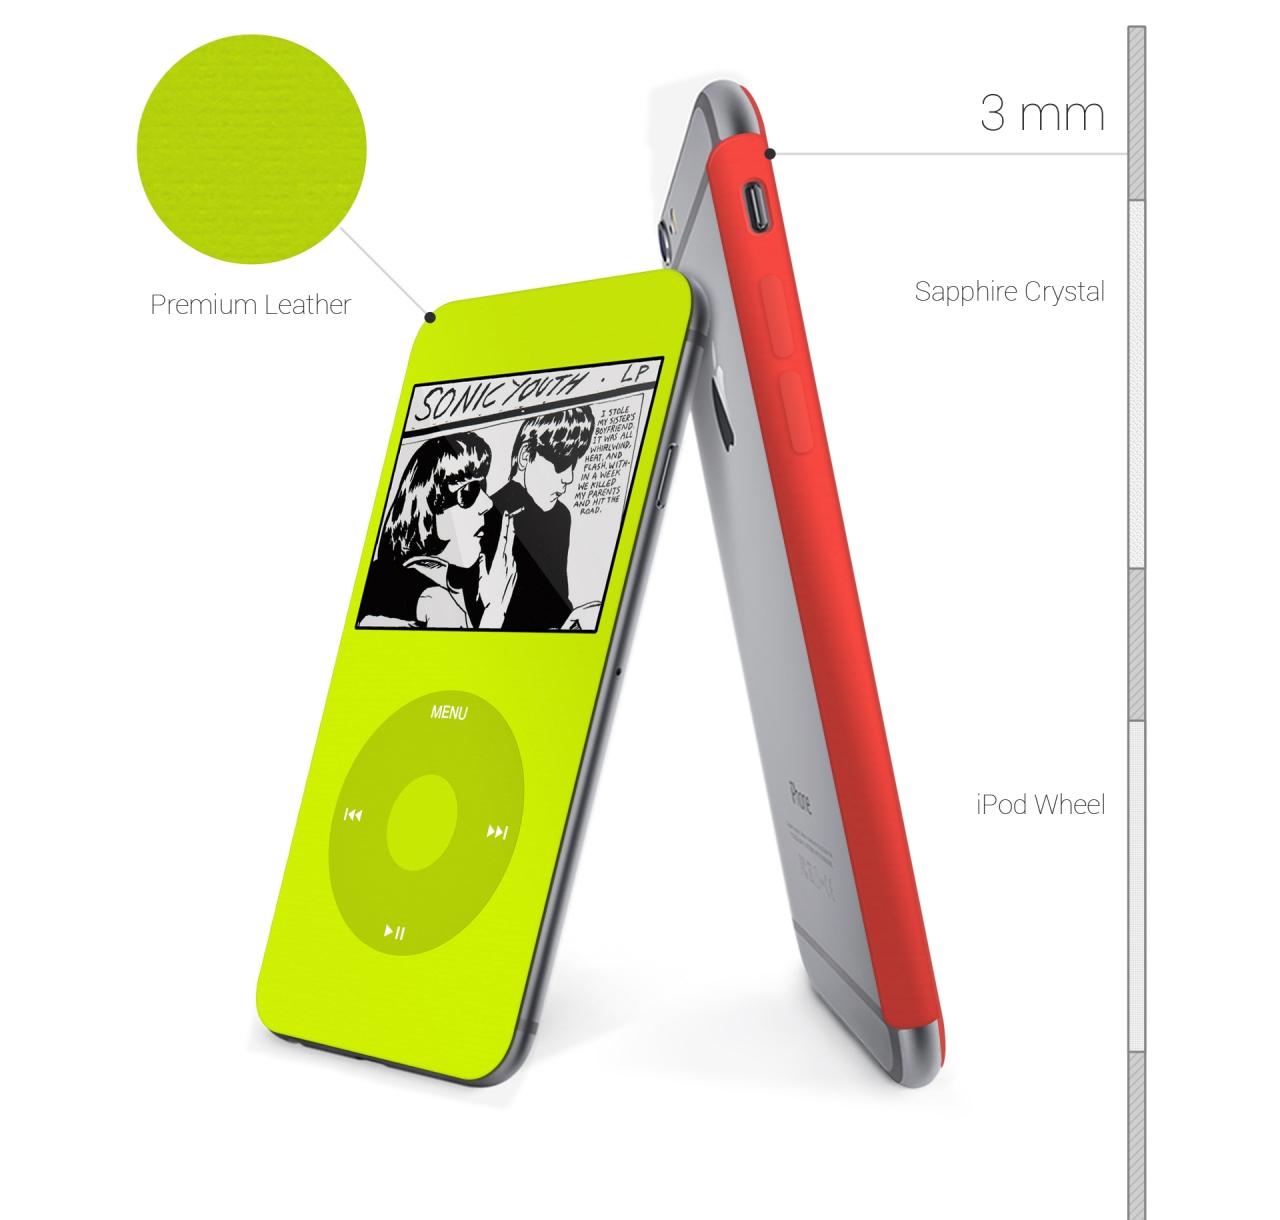 iPod-classic-capinha-iphone-conceito4